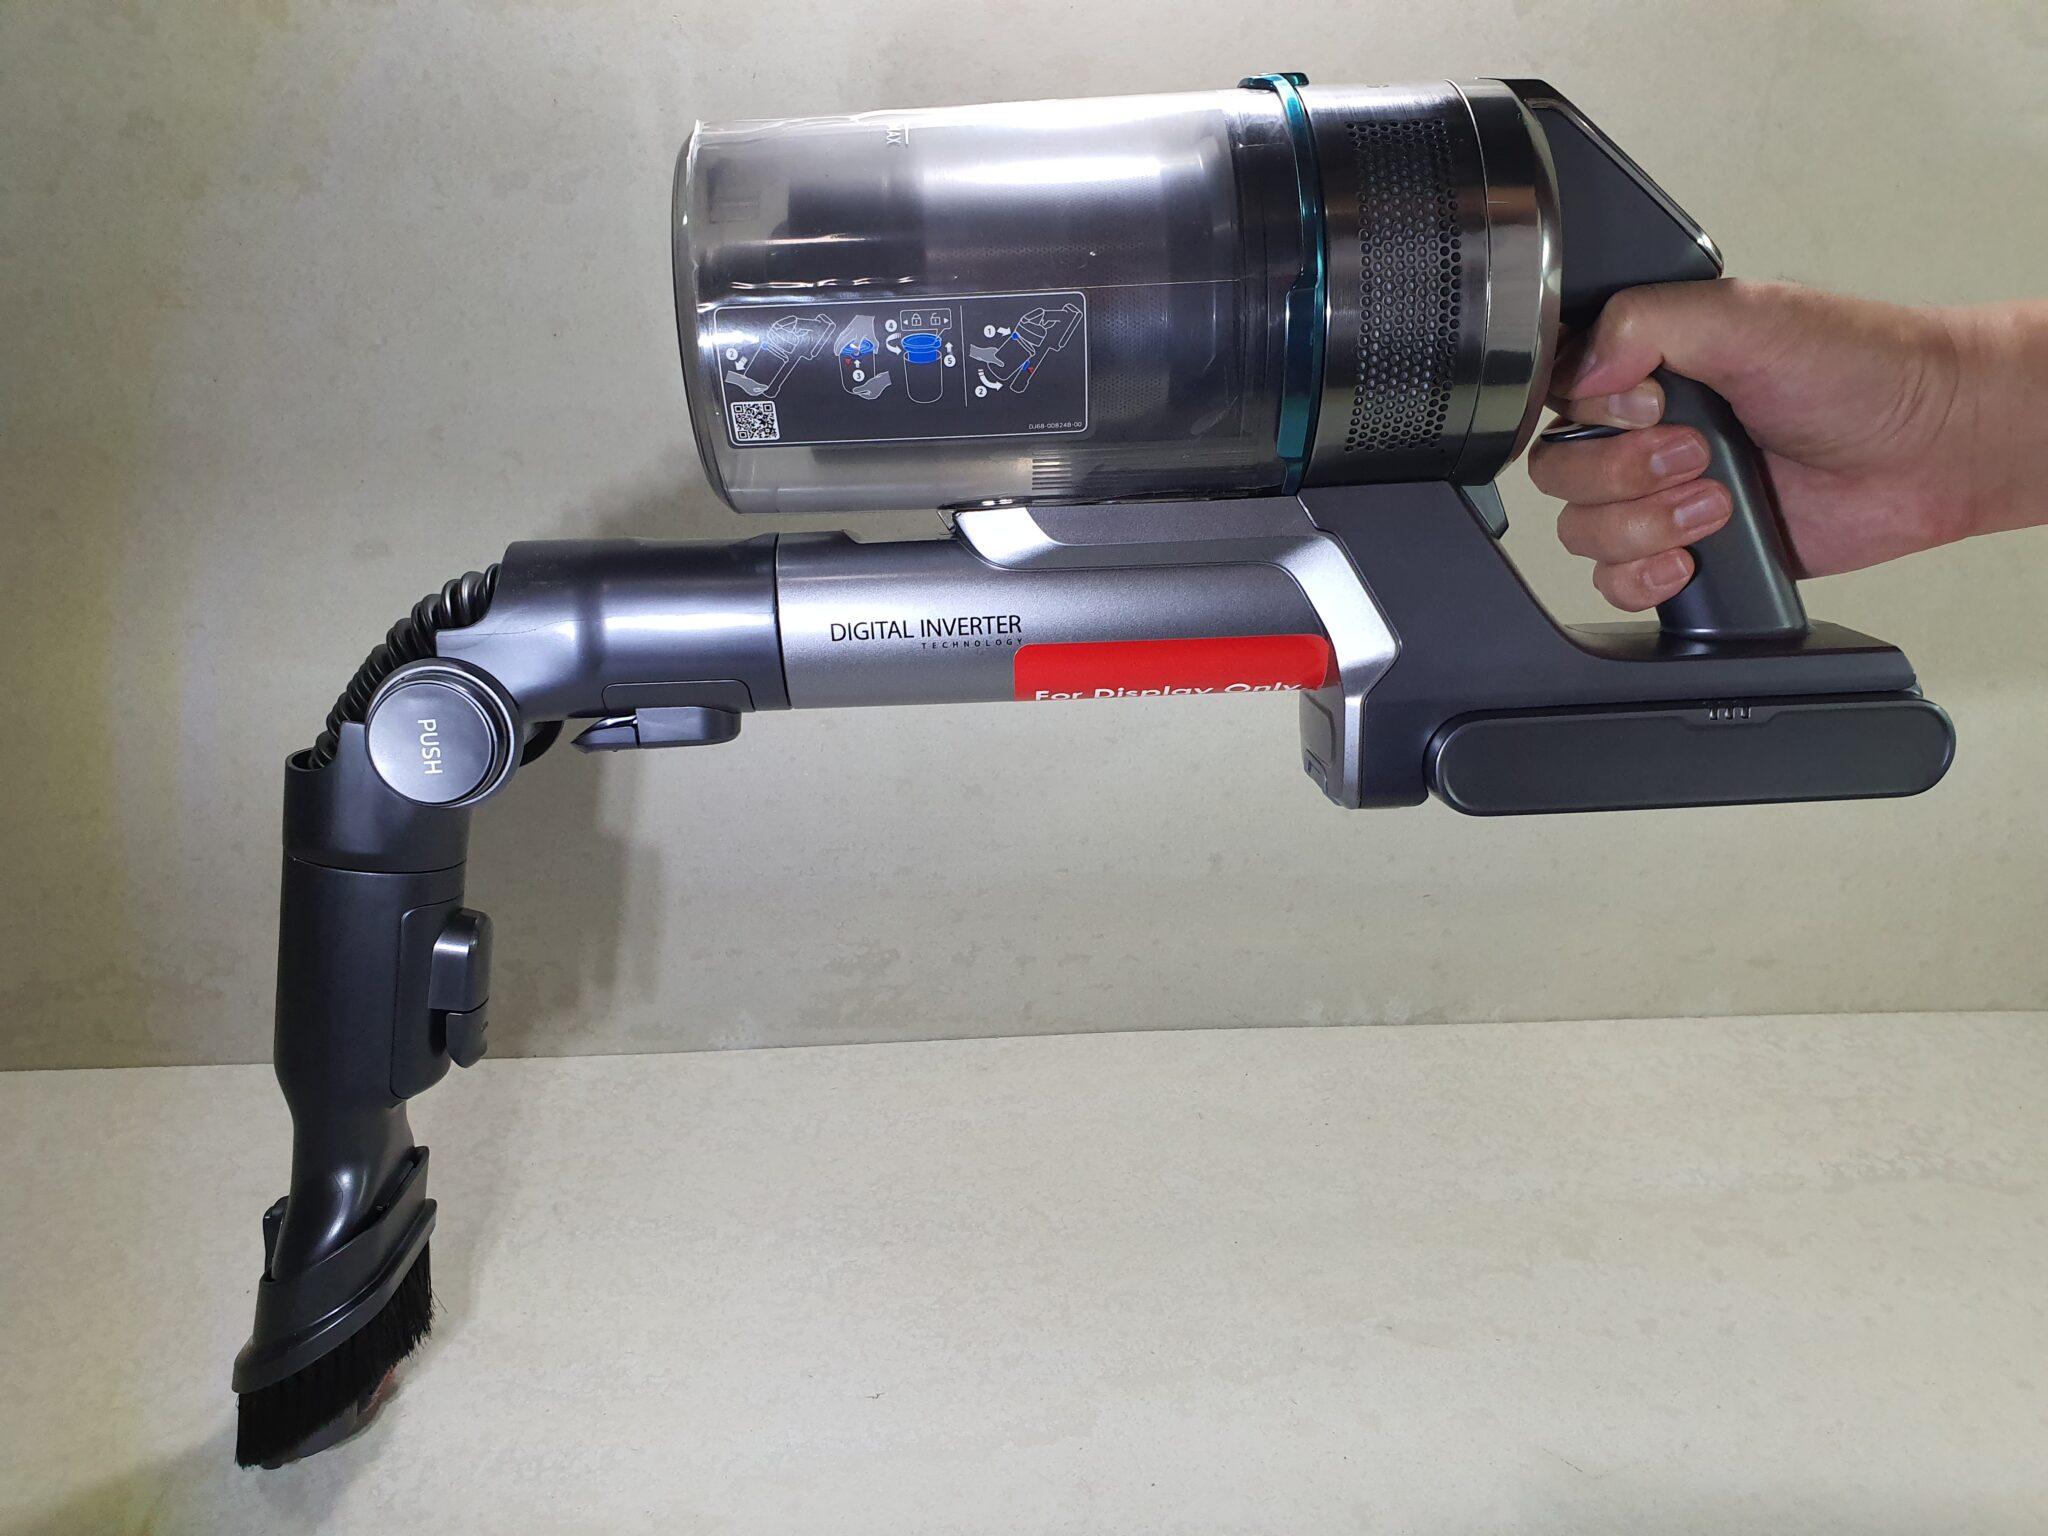 POWERstick Jet flexible tool